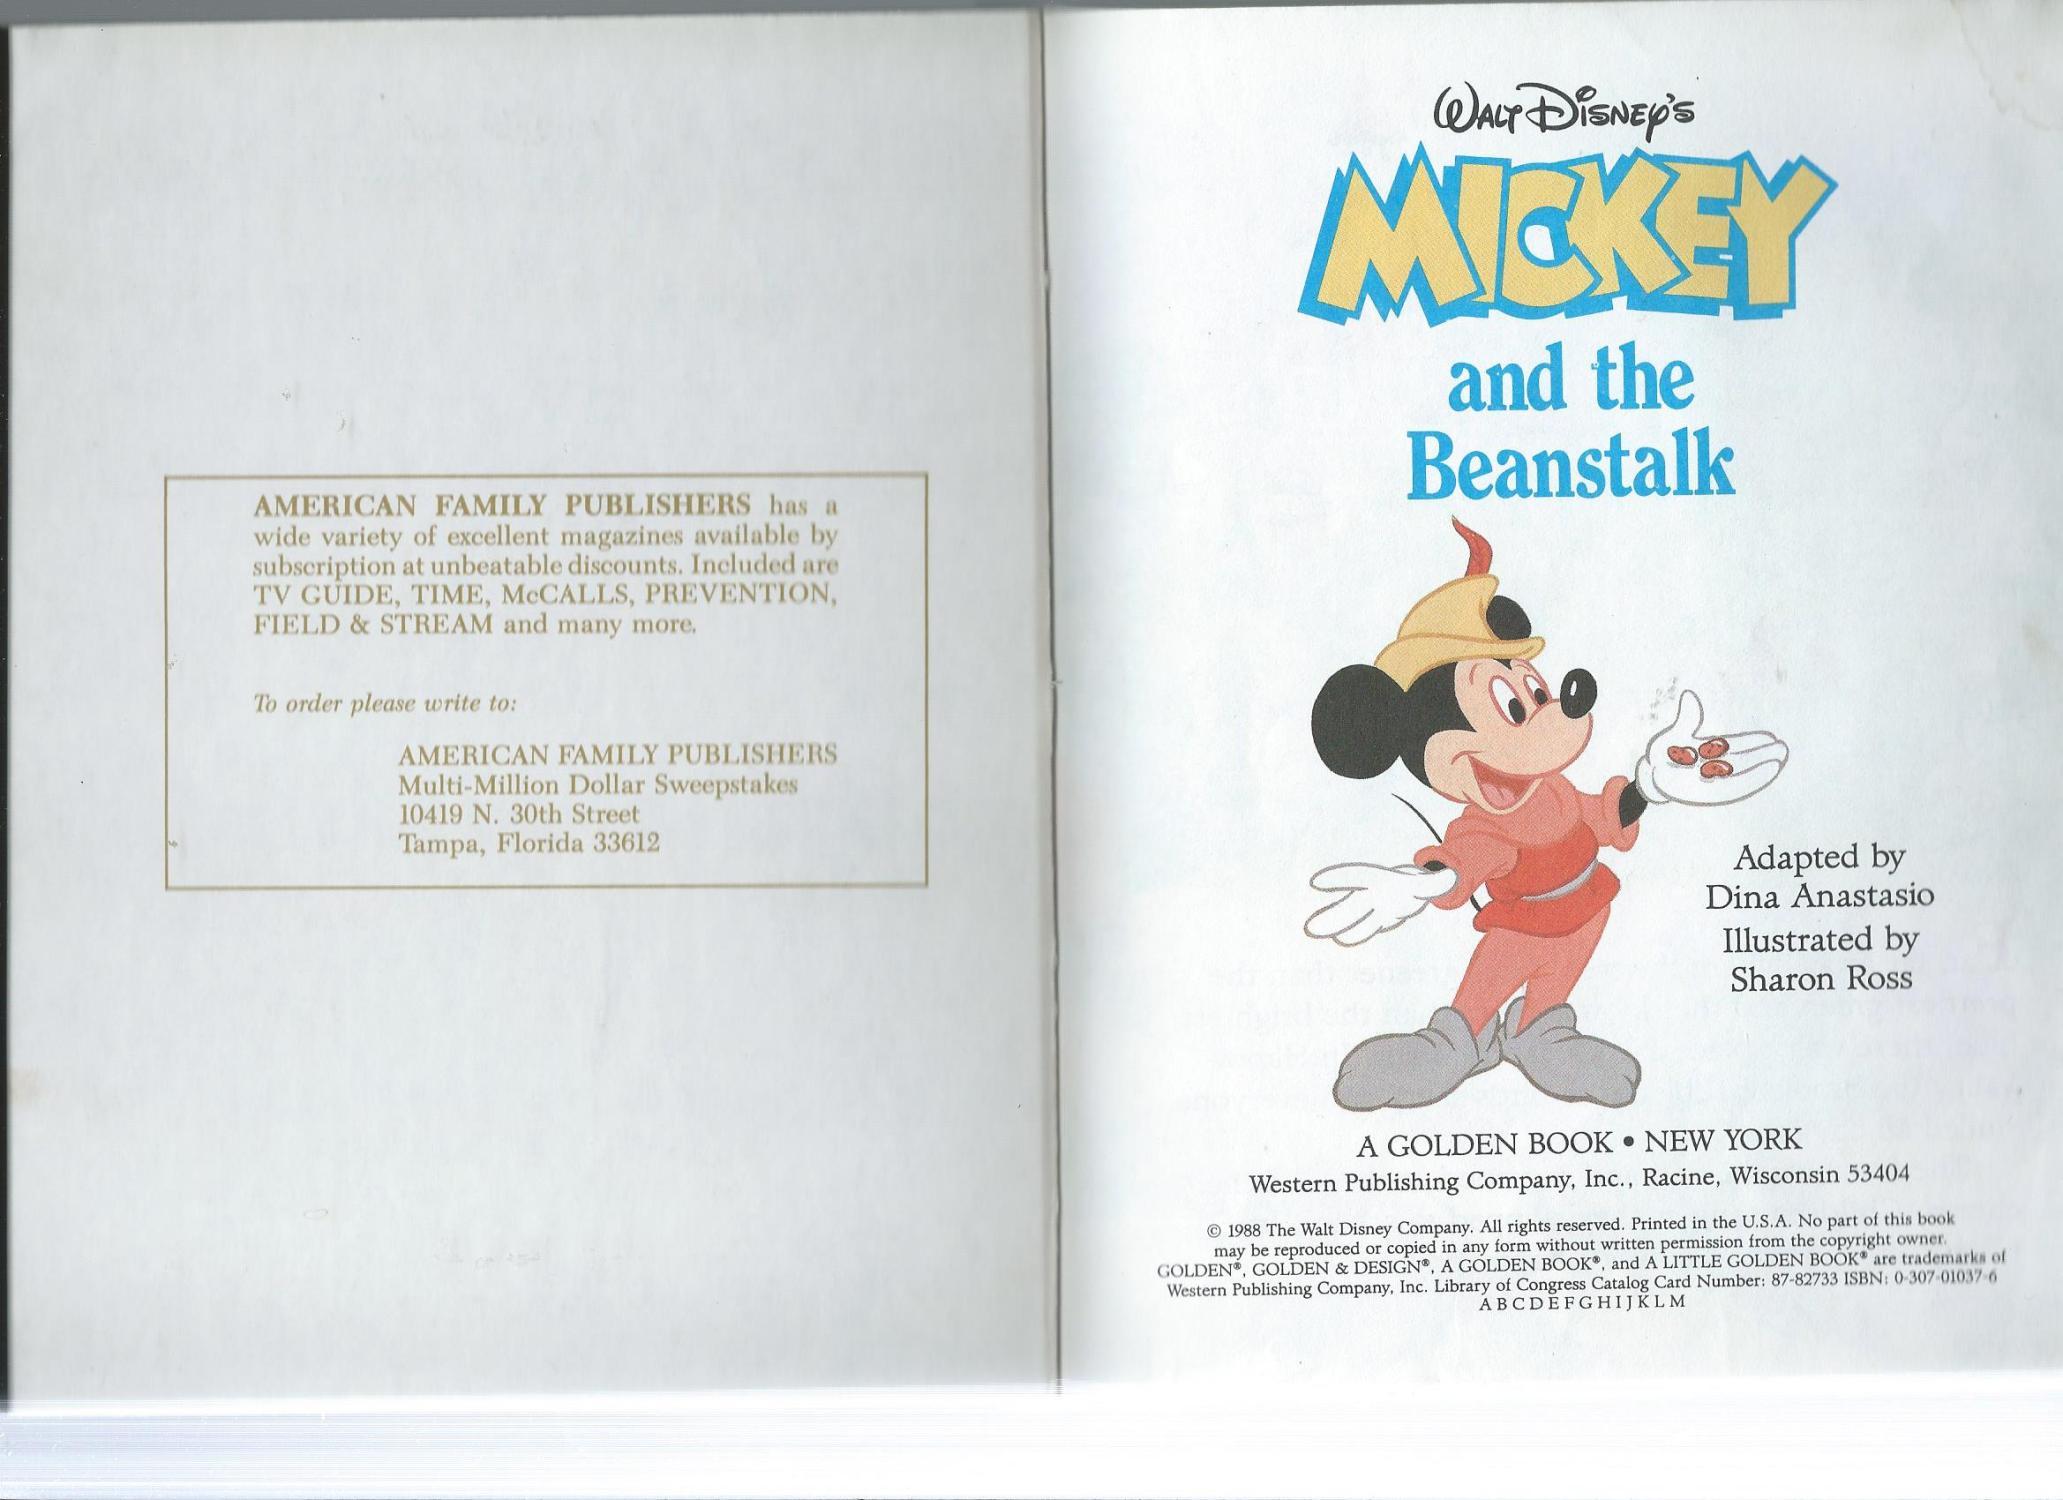 Walt Disney's Mickey and the Beanstalk